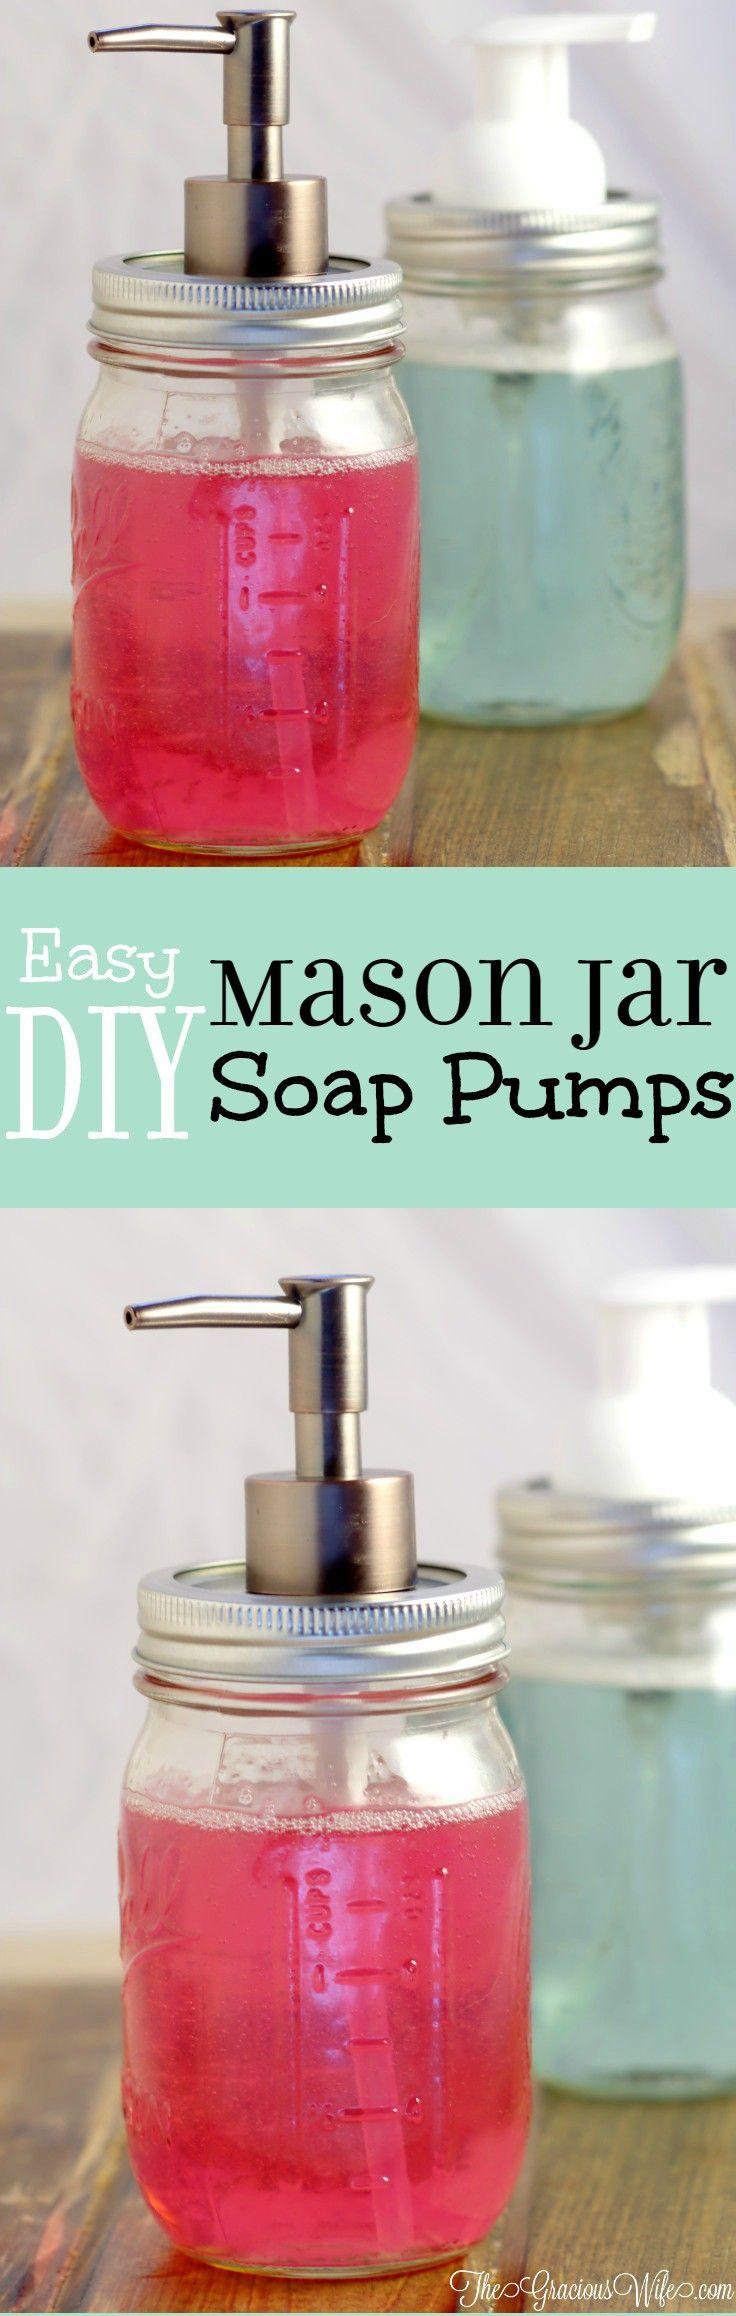 Easy DIY Mason Jar Soap Pump